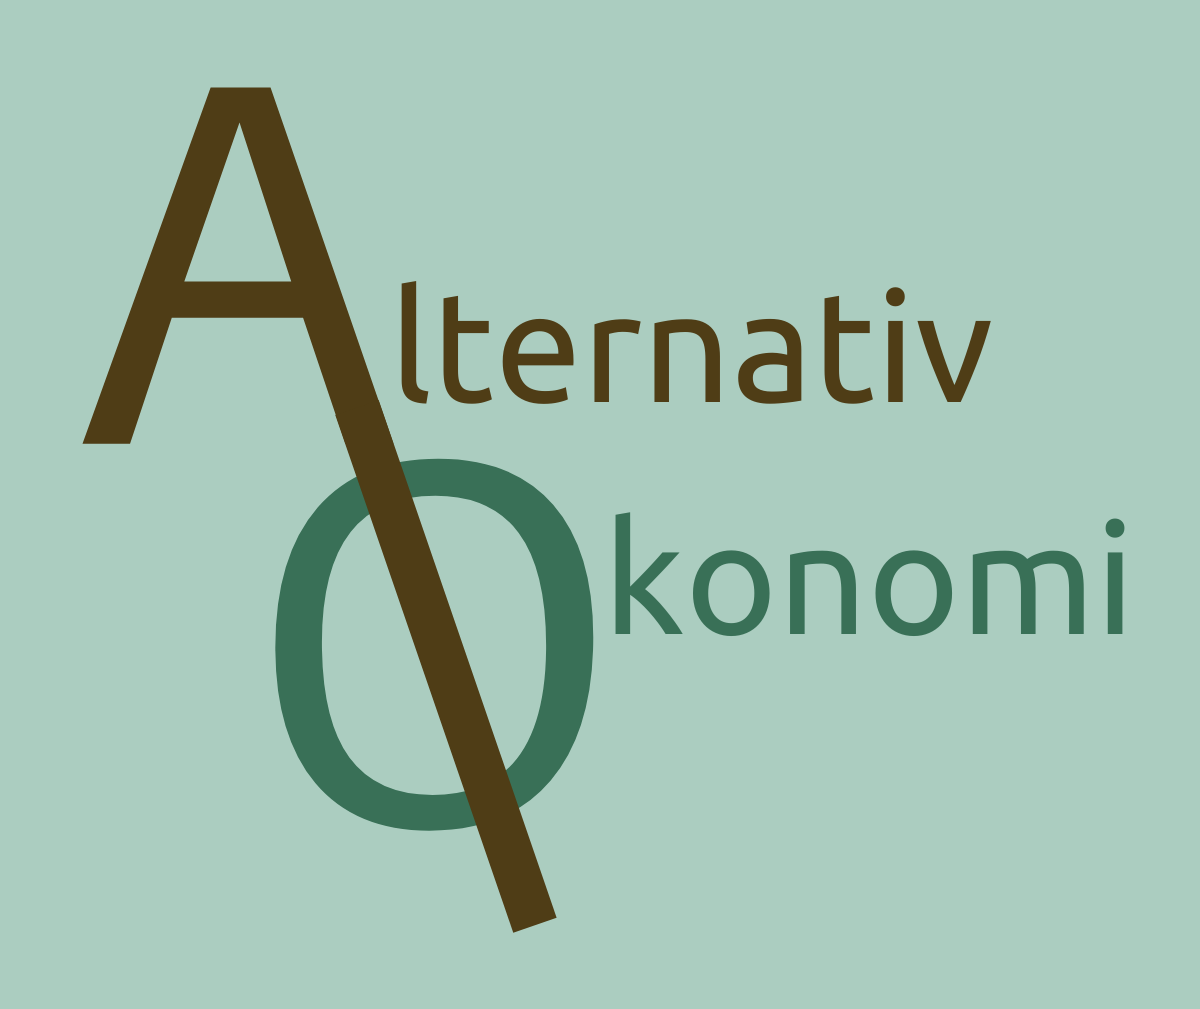 Alternativ økonomi